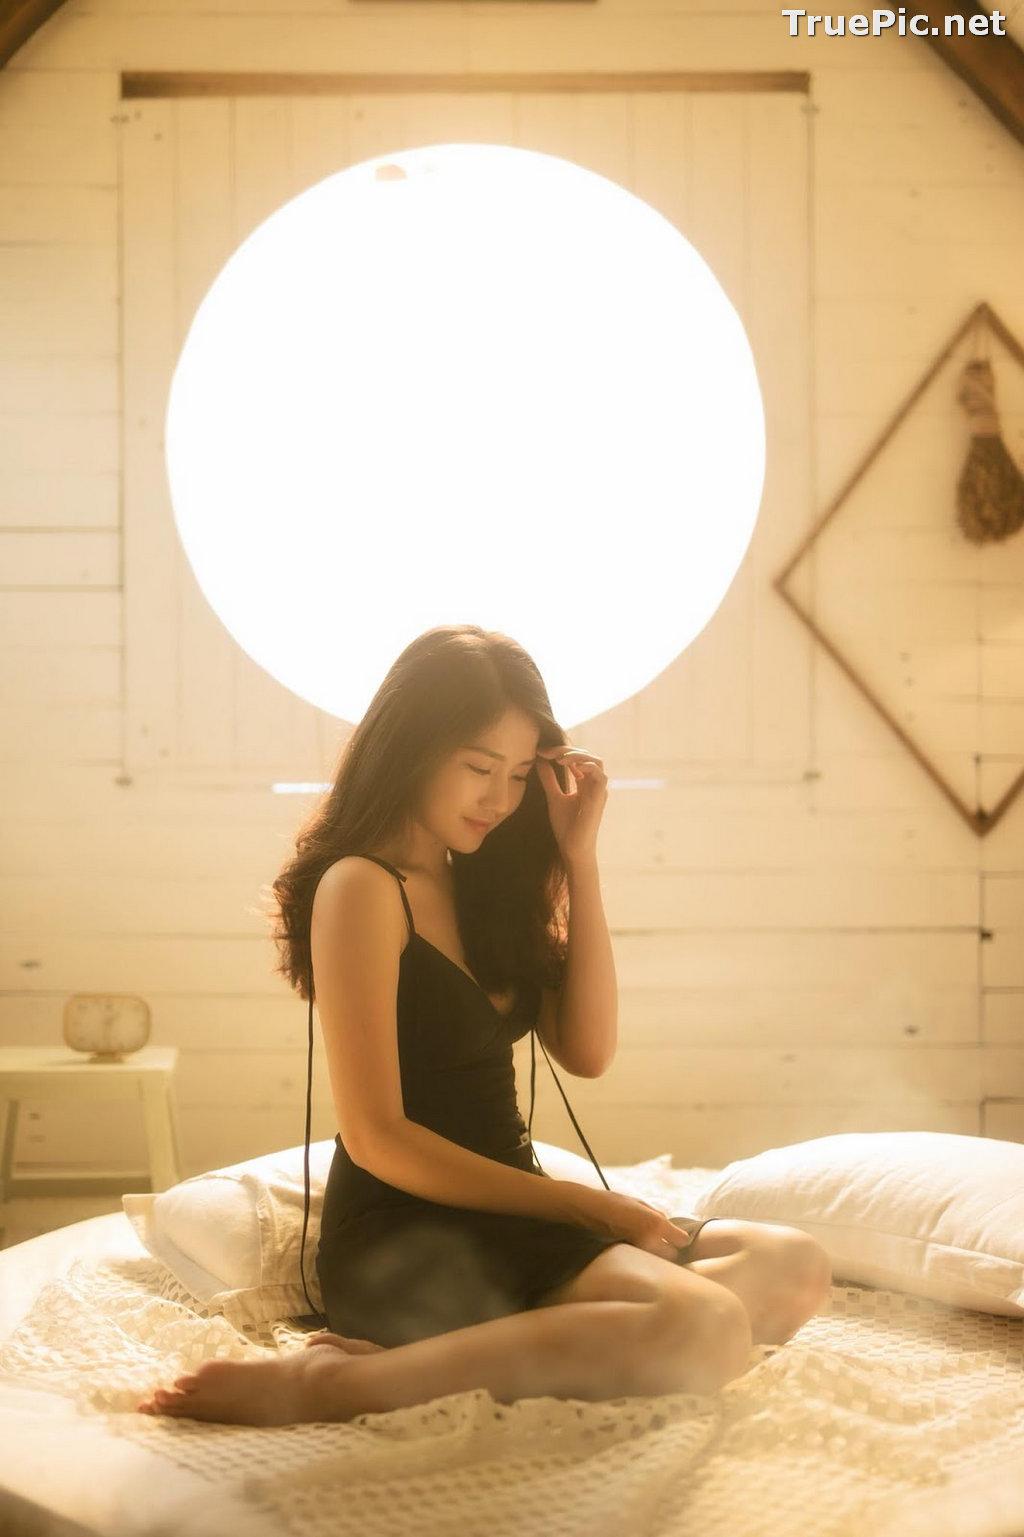 Image Vietnamese Hot Girl - Nguyen Hoang Kieu Trinh - My Black Angel - TruePic.net - Picture-8